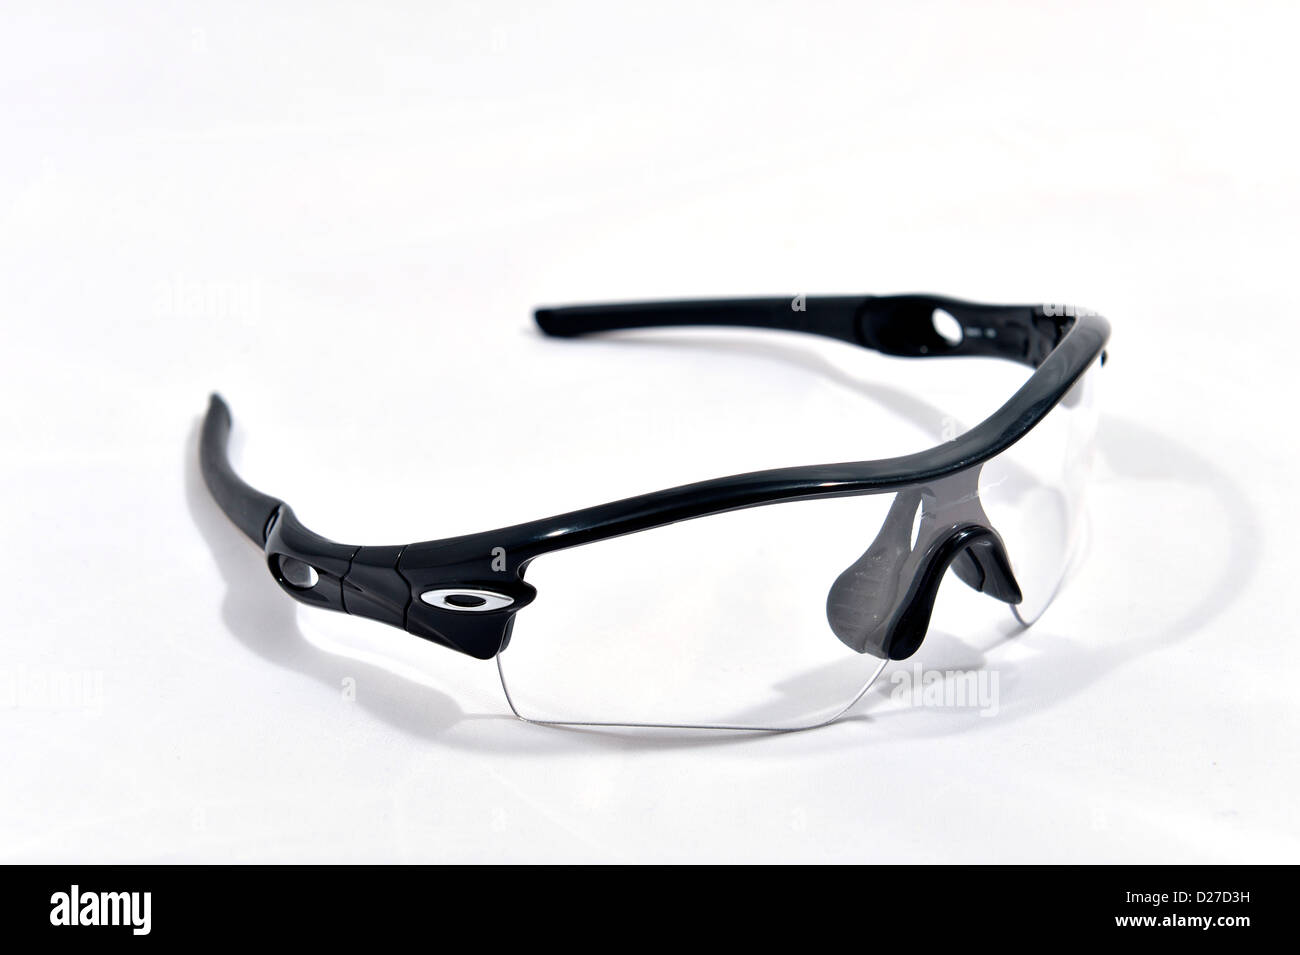 oakley sports glasses